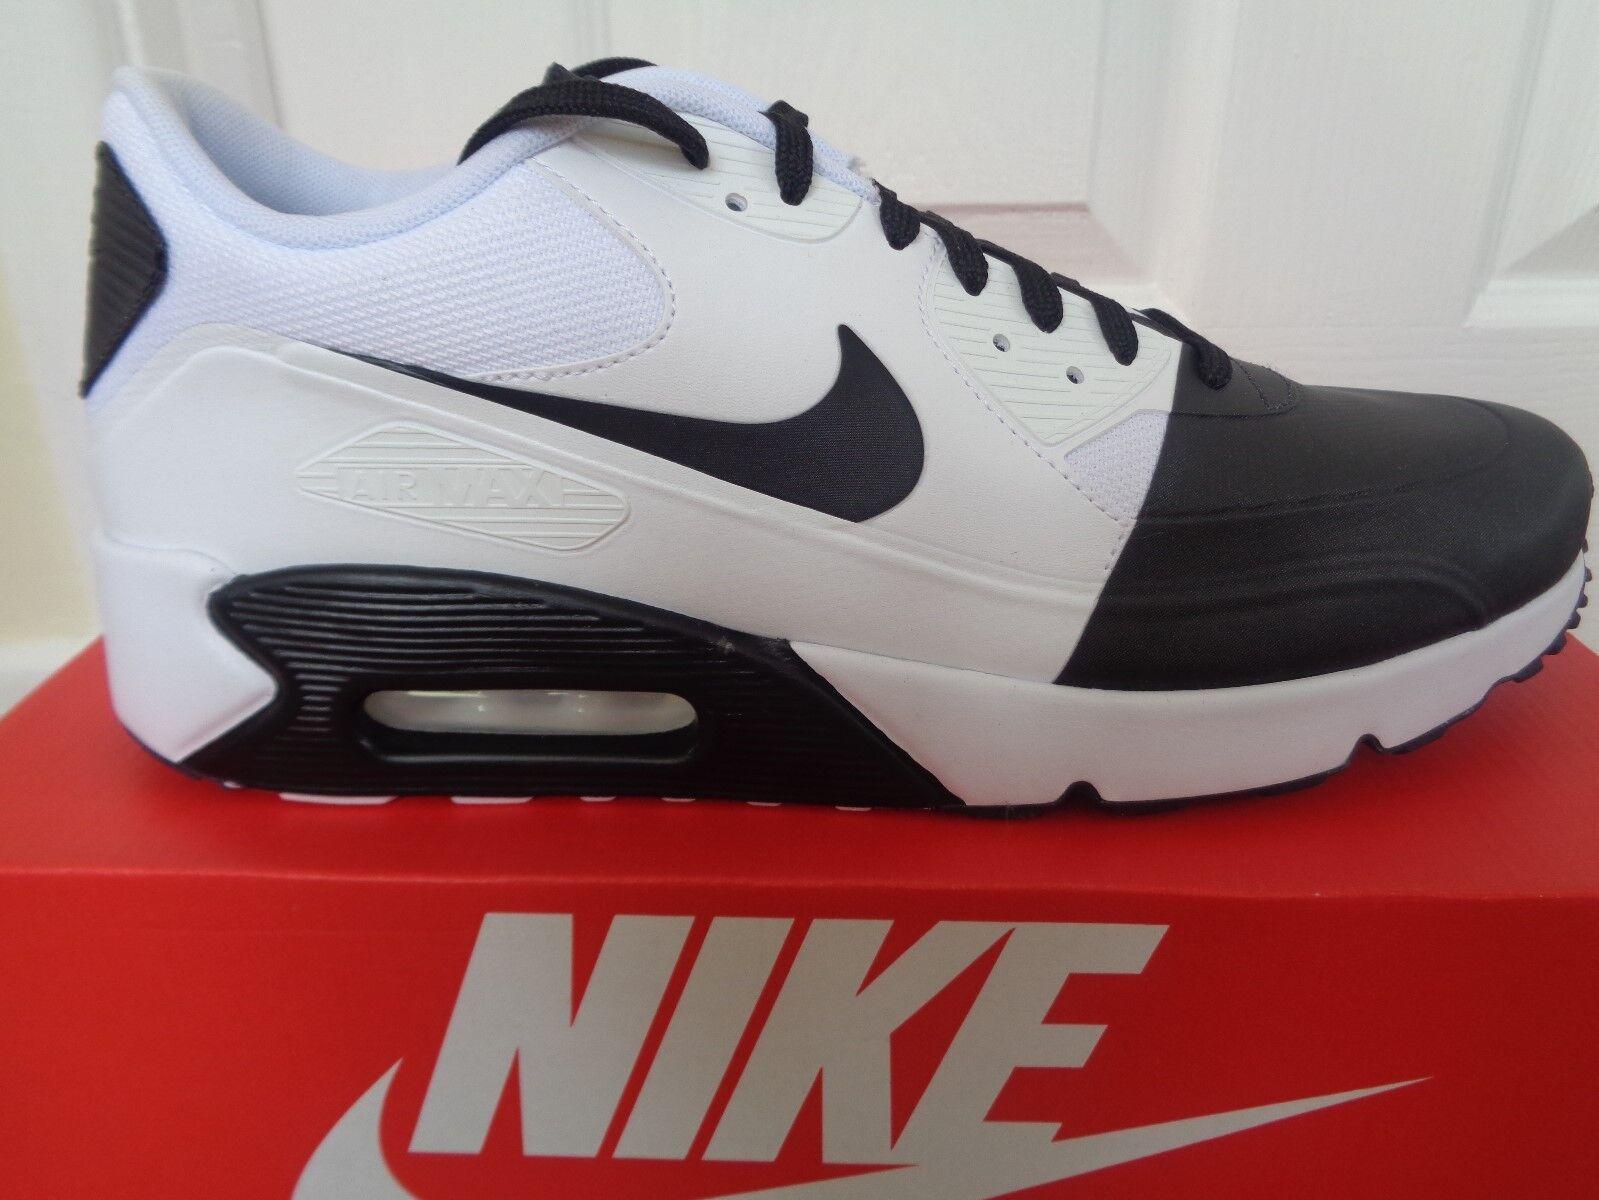 Max 90 Ultra 2.0 Nike Air SE Zapatillas  nos Zapatillas  876005 002 nos  11 Nuevo 36b9a4